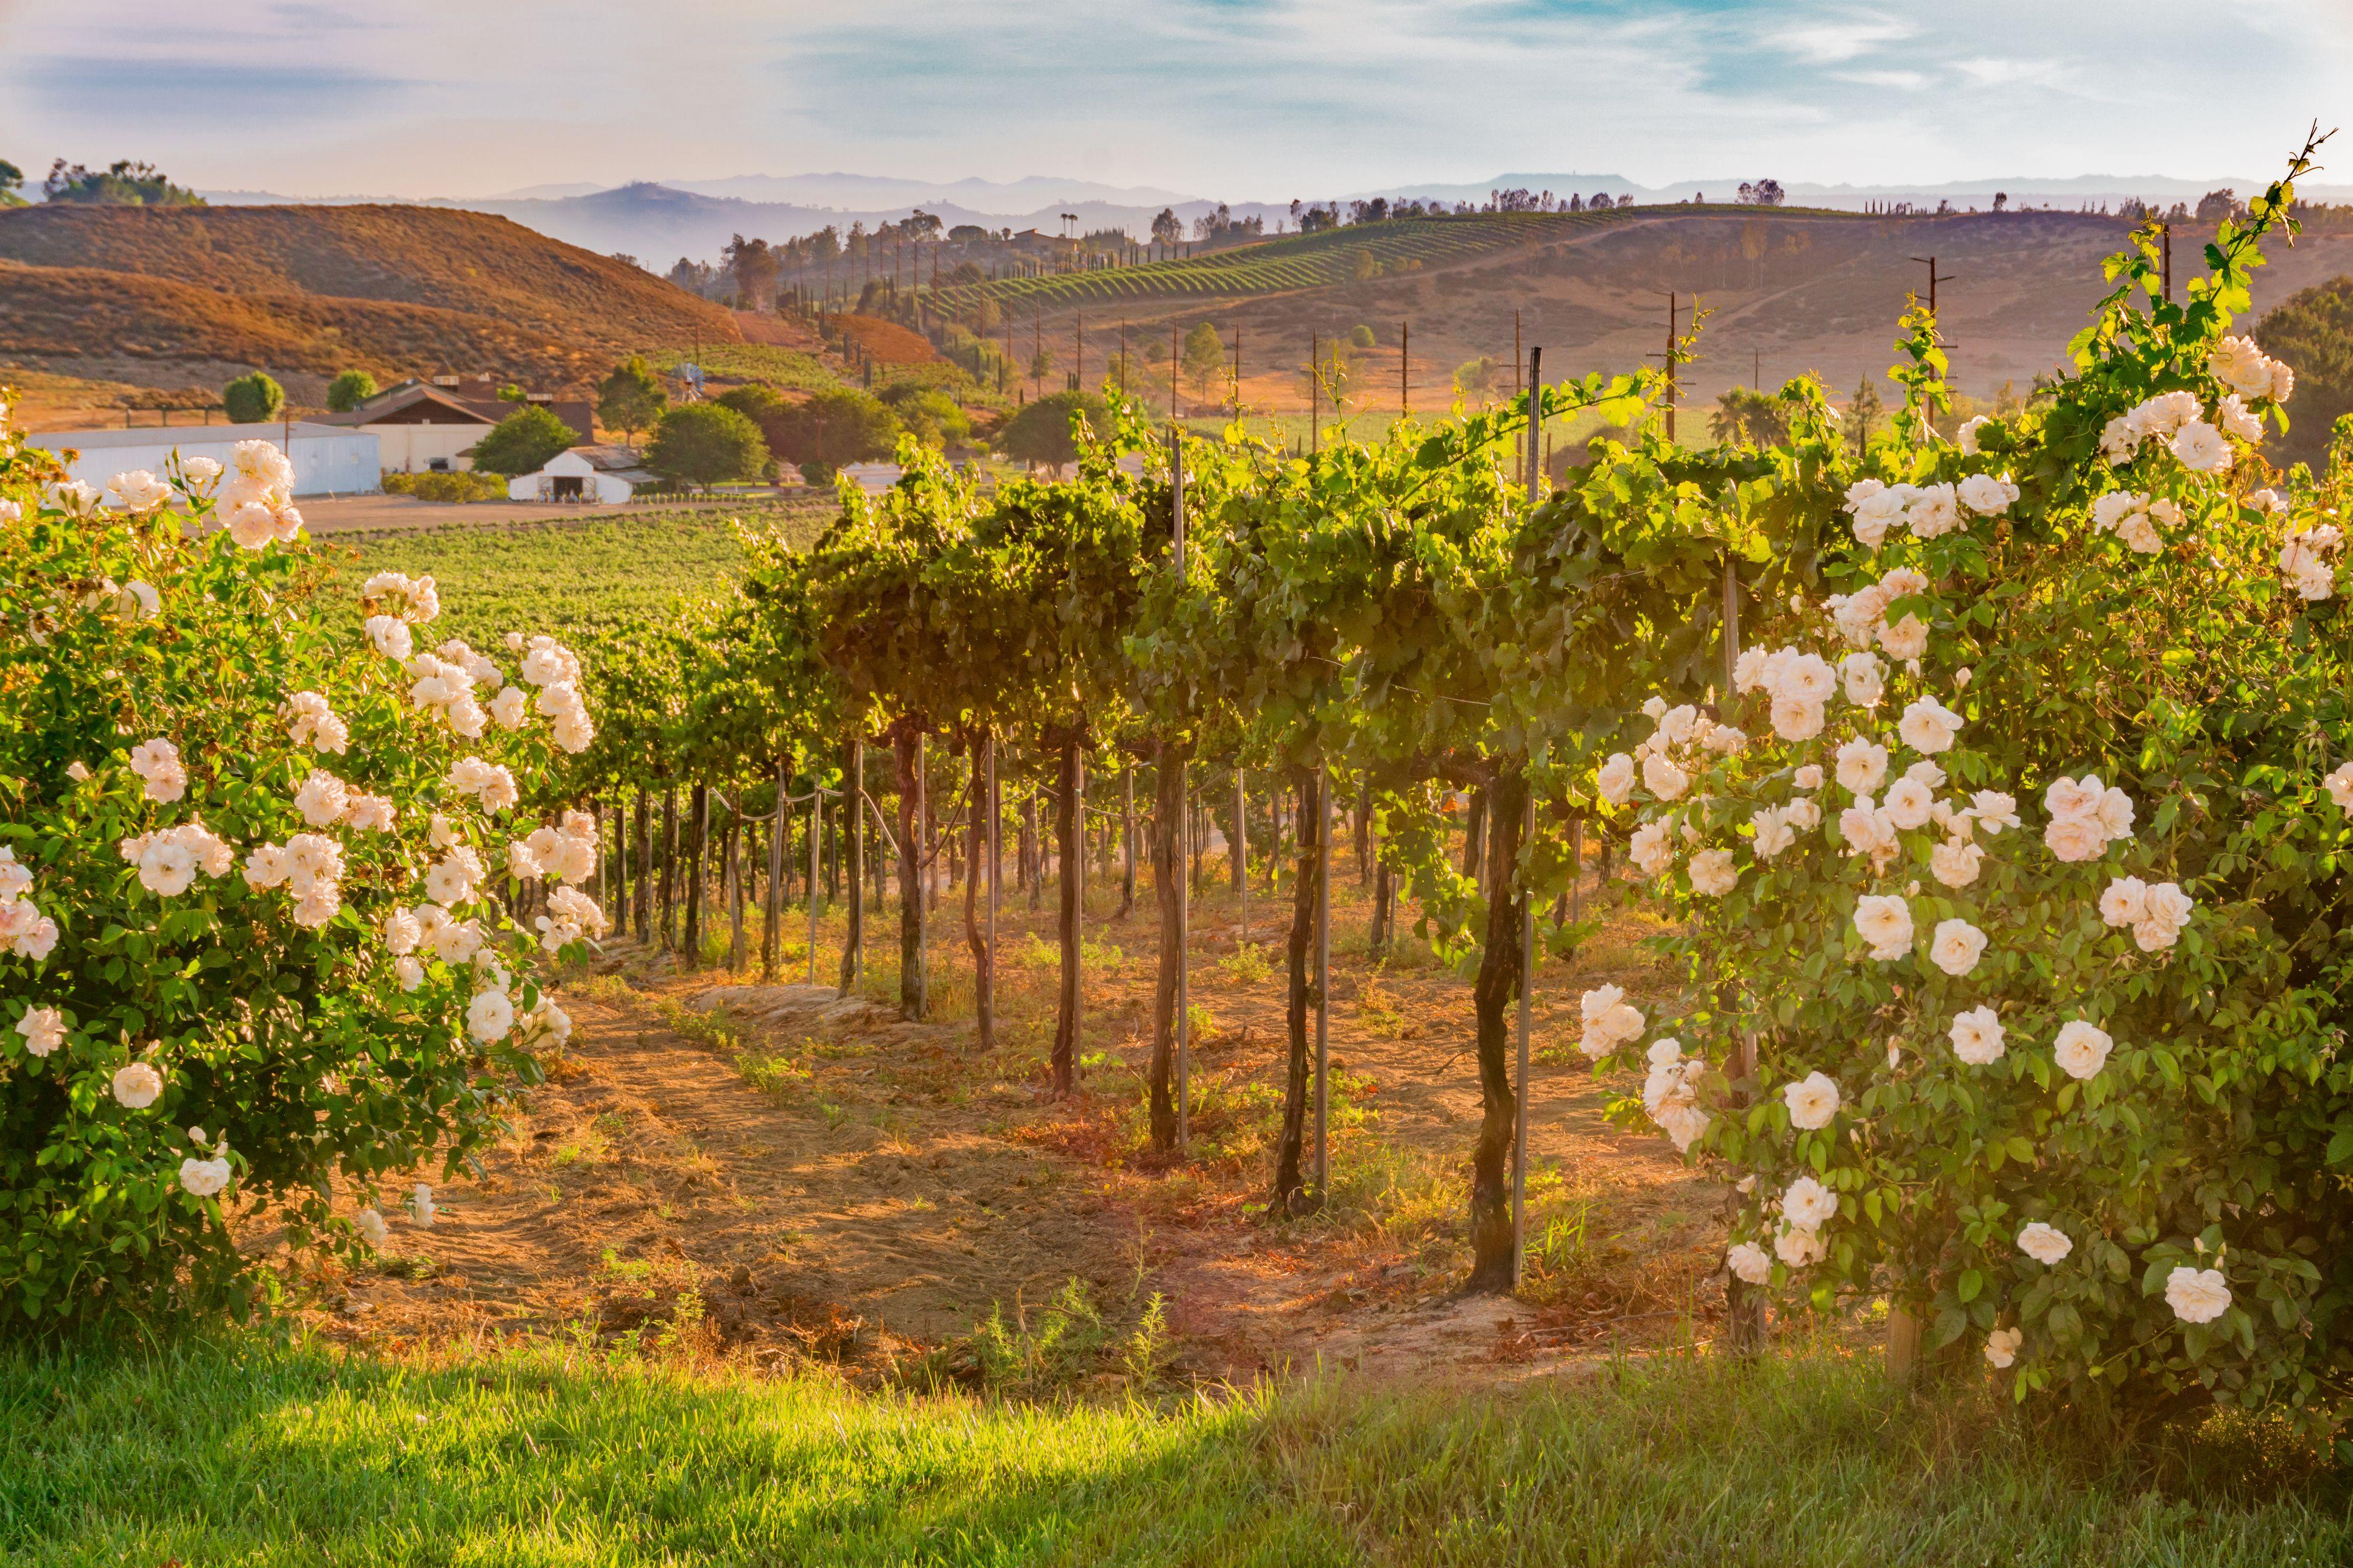 California Vineyard at Dusk with white roses (P)